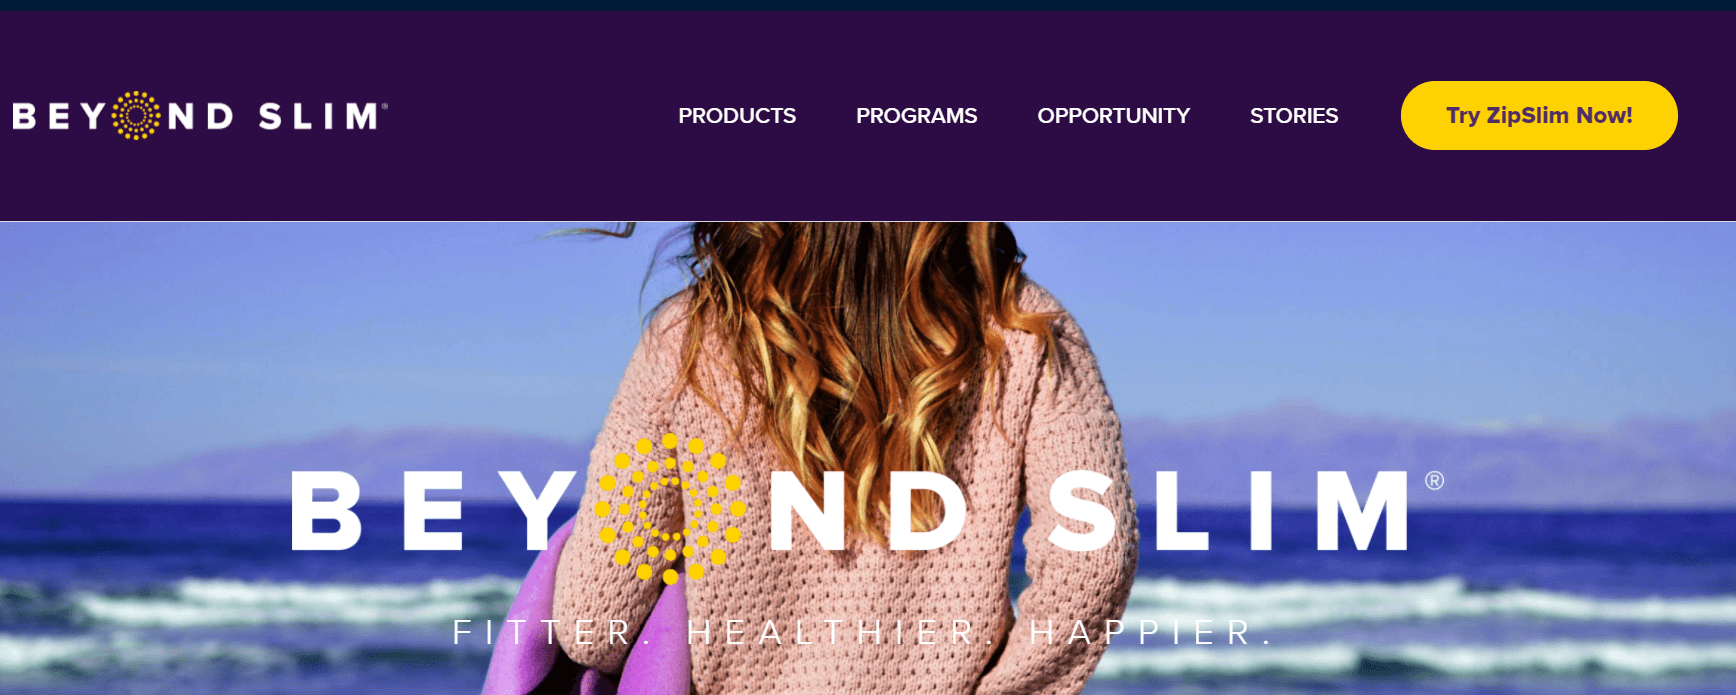 BeyondSlim.com